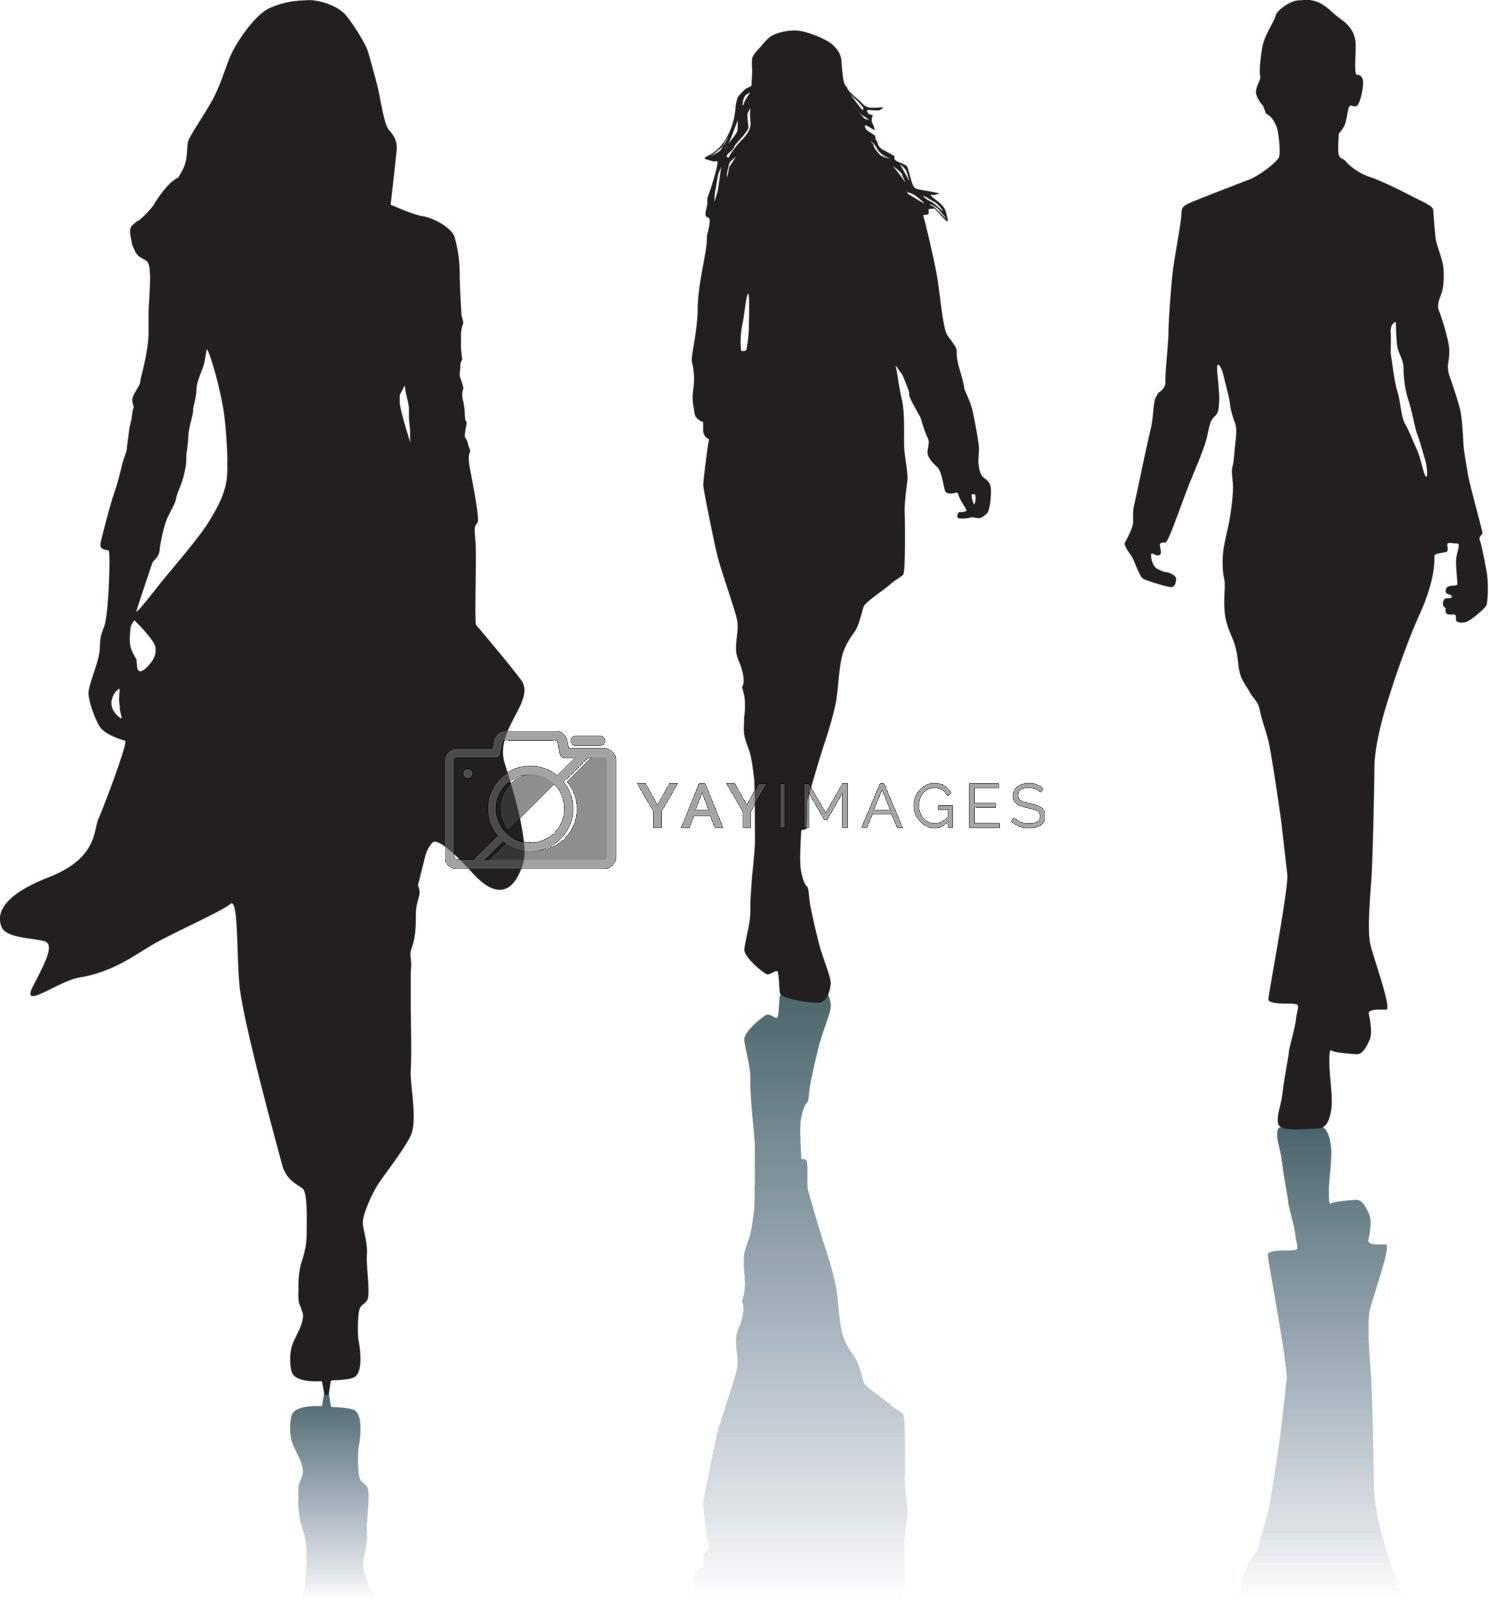 Silhouette fashion women